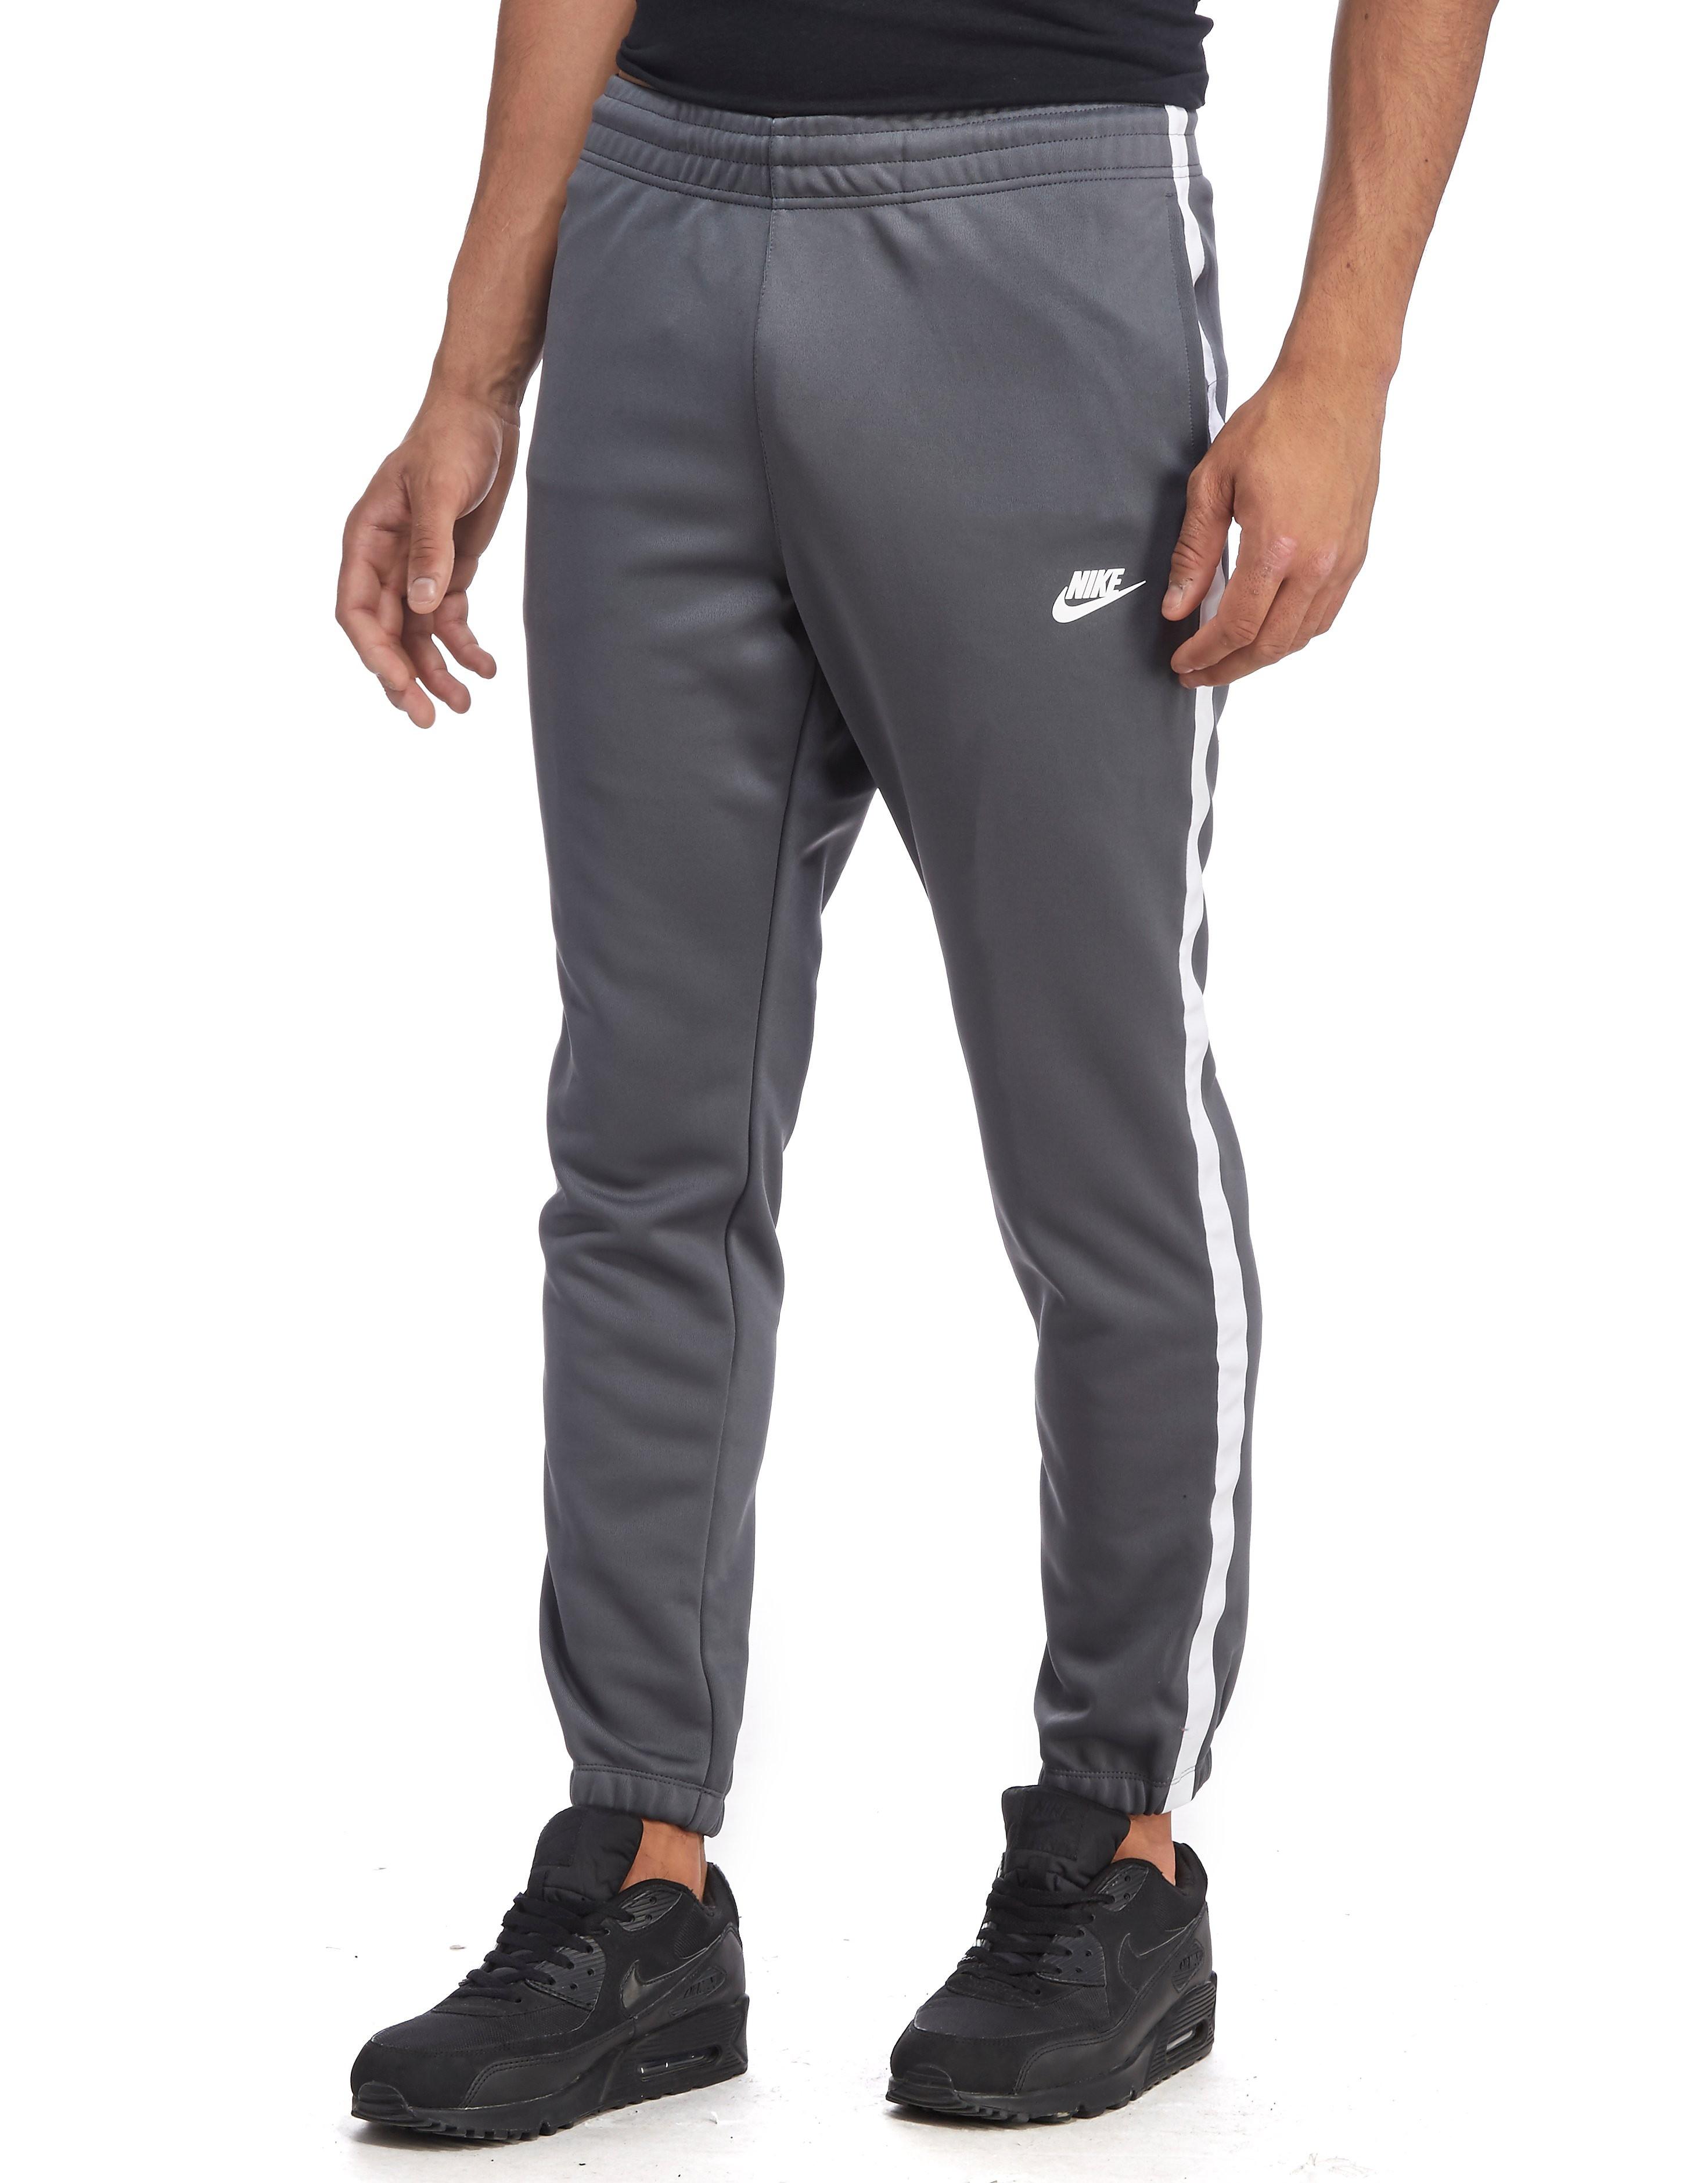 Nike Limitless Poly Pants